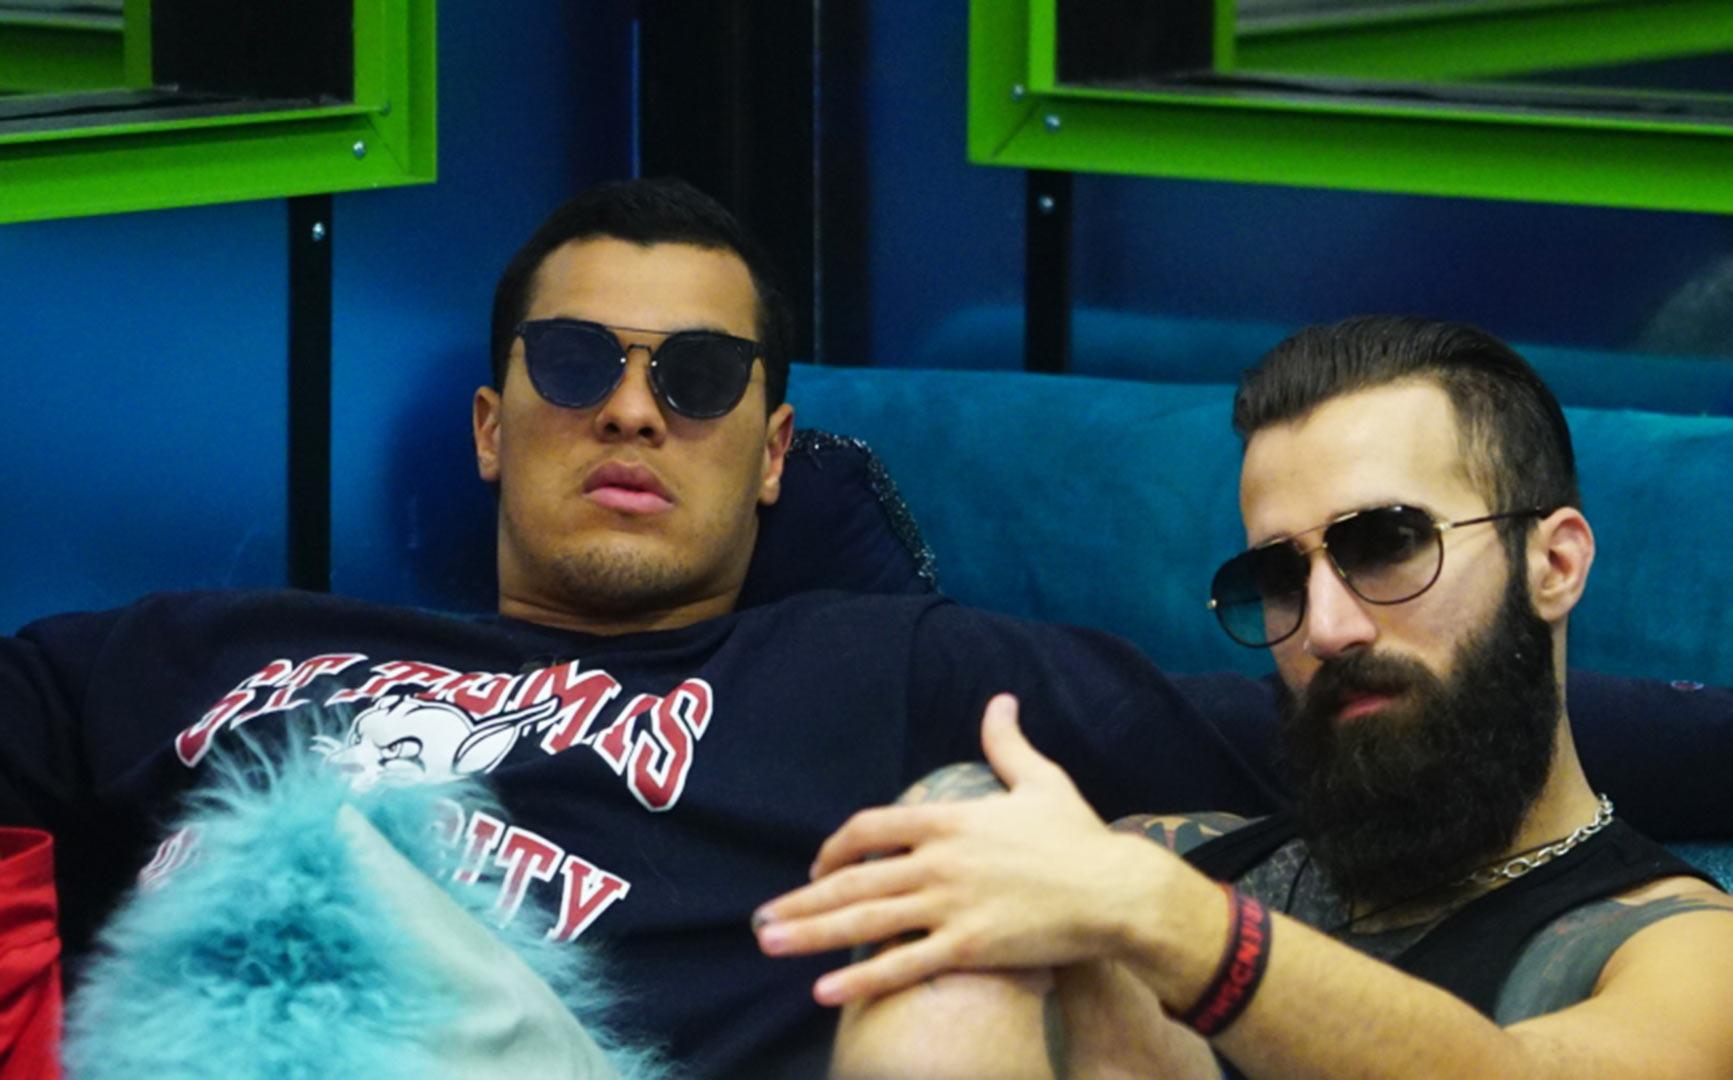 Josh Martinez and Paul Abrahamian